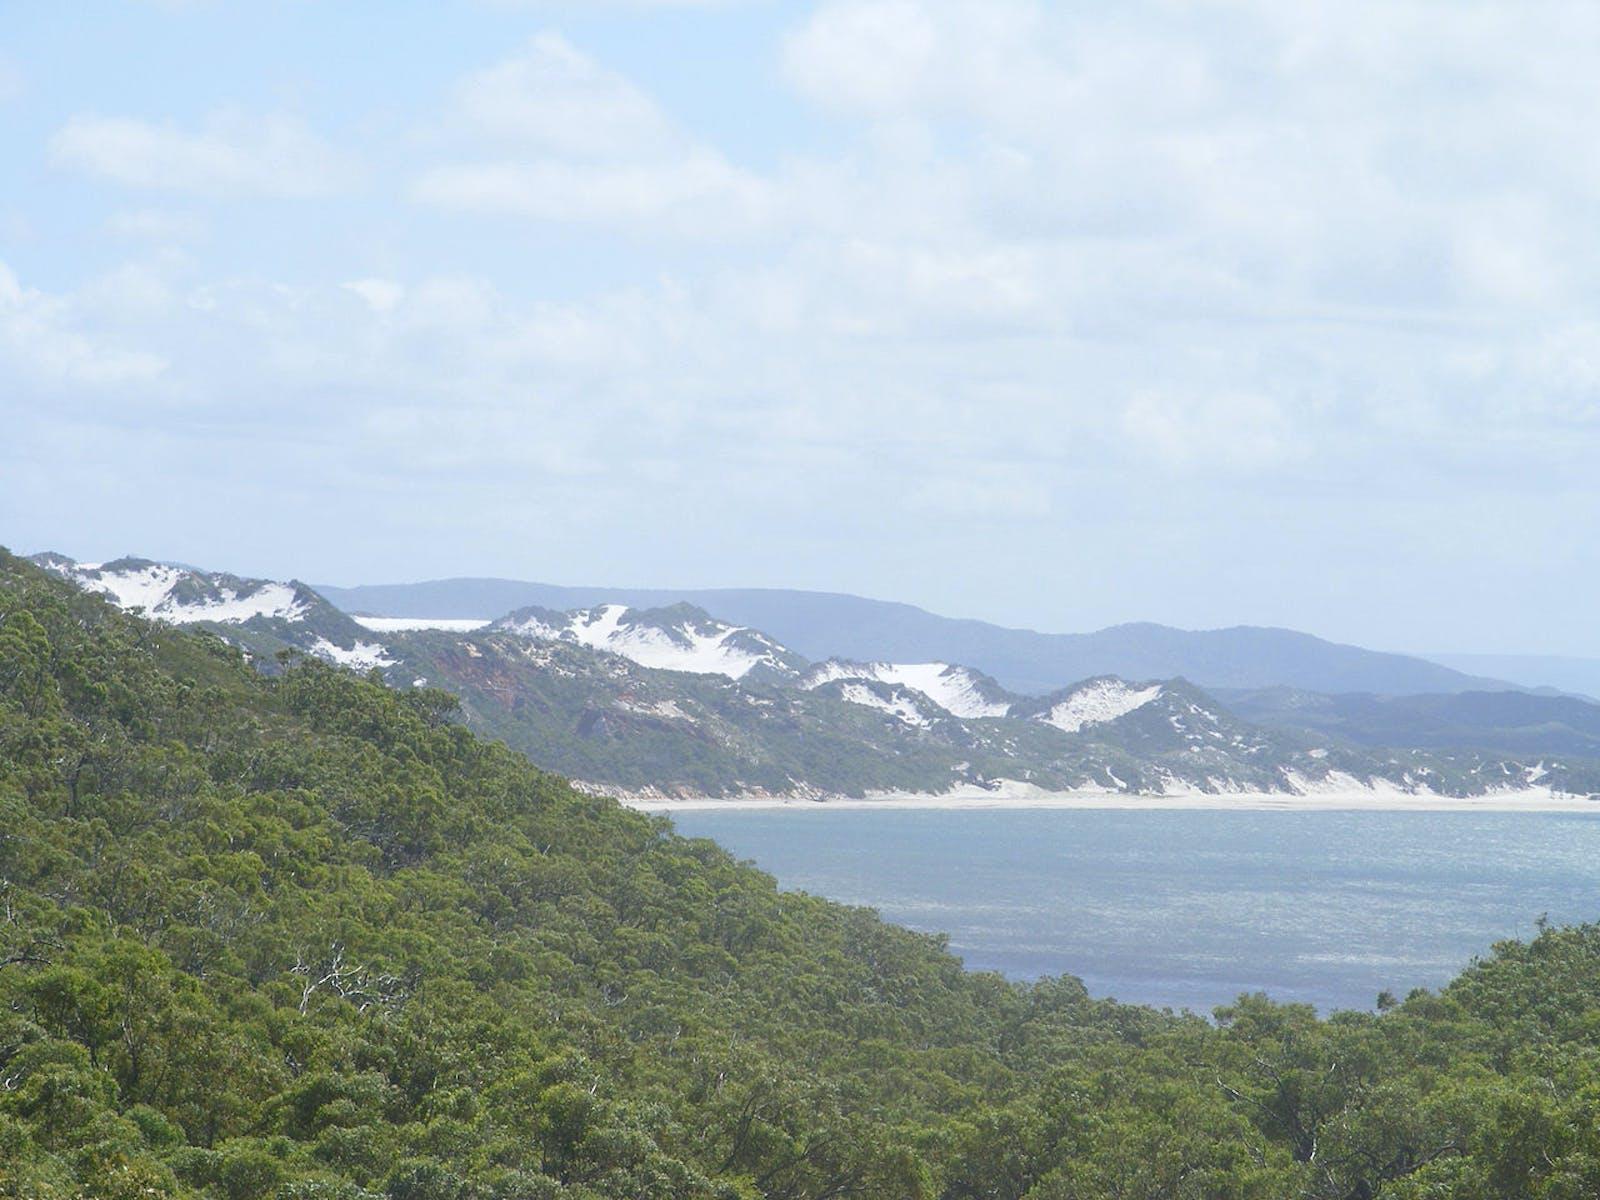 Cape York Peninsula Tropical Savanna